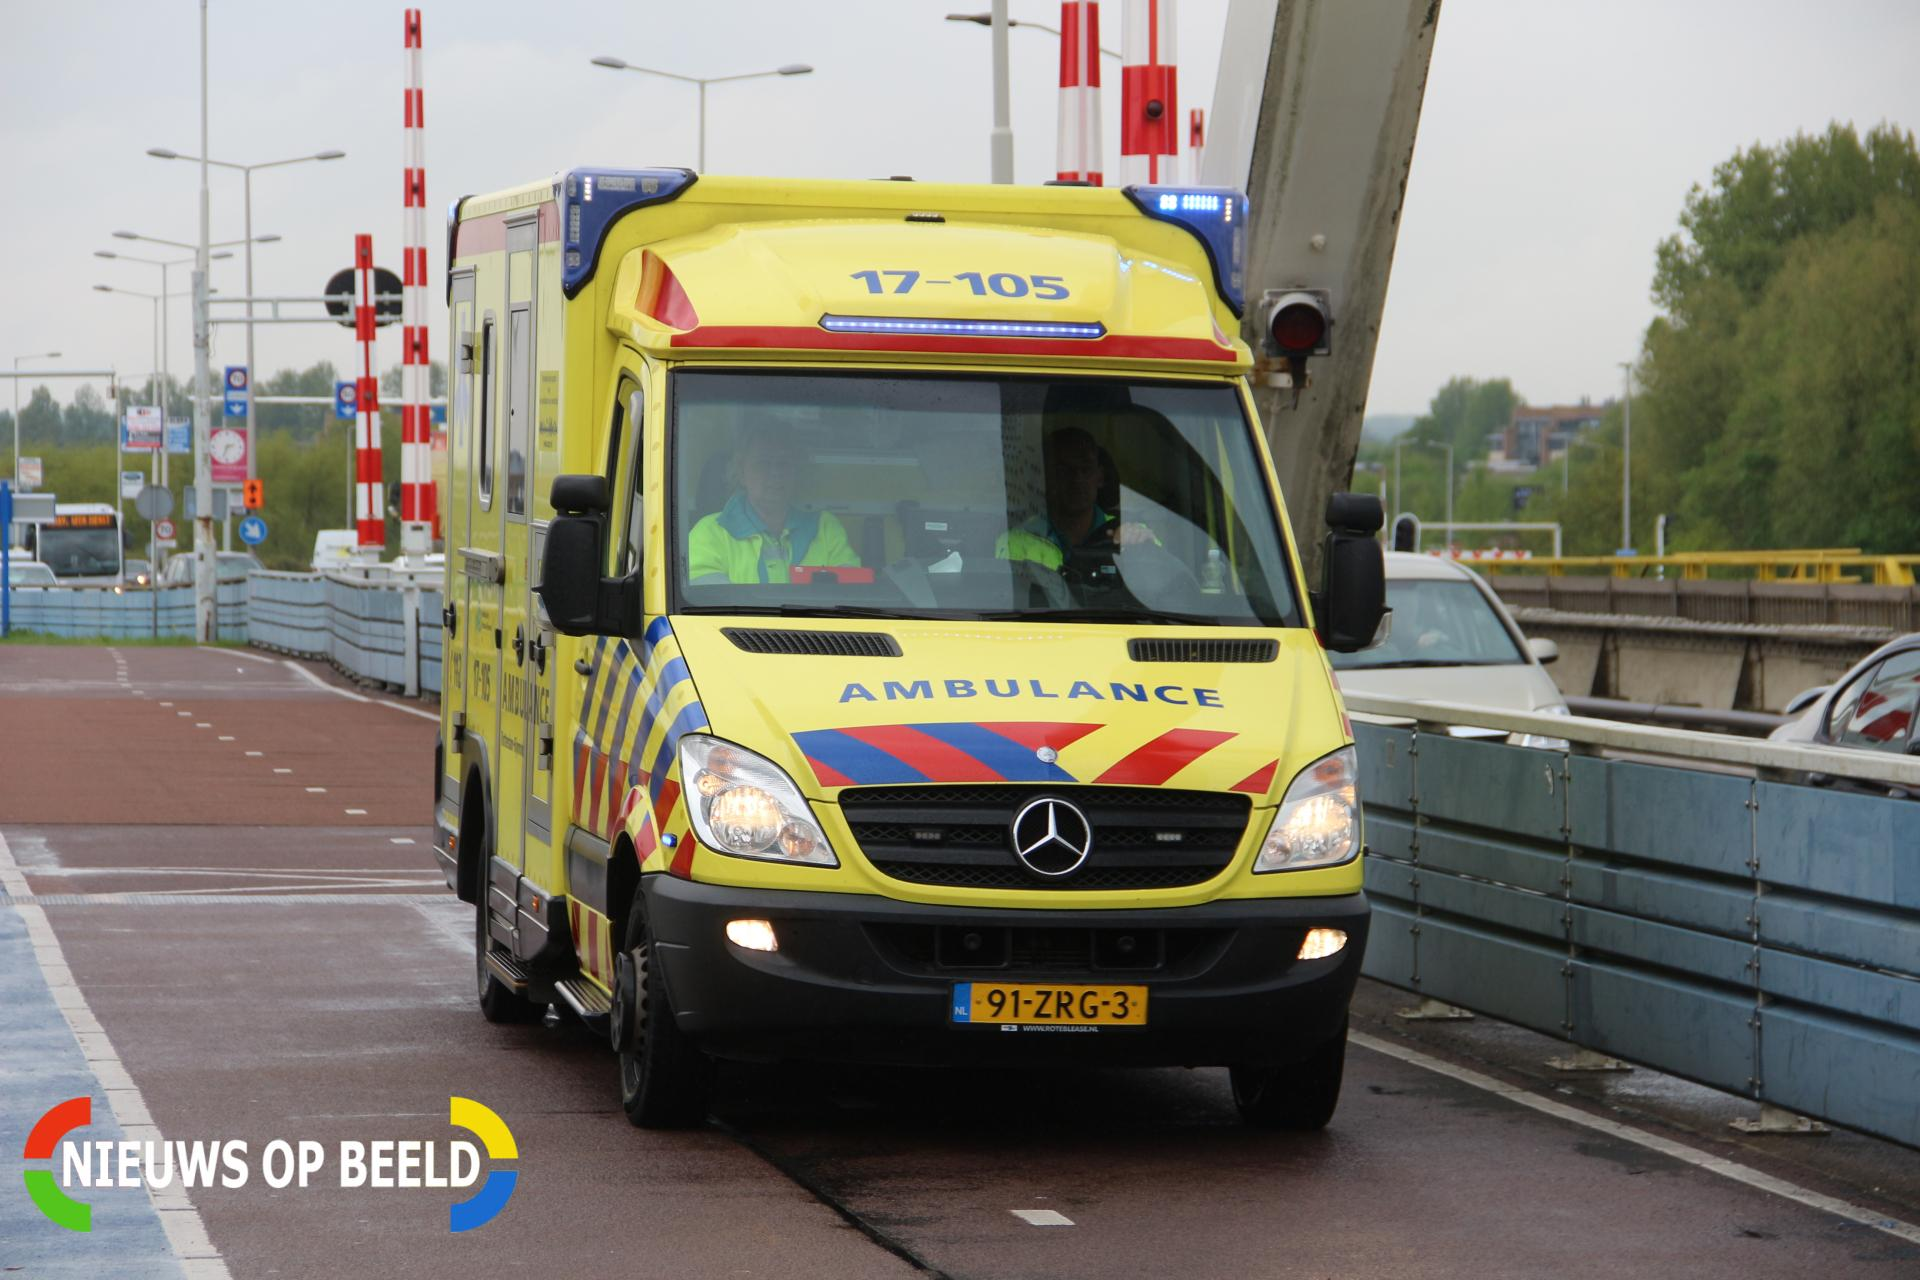 Vier gewonden nadat auto op hoogwerker botst Suurhoffbrug Rotterdam